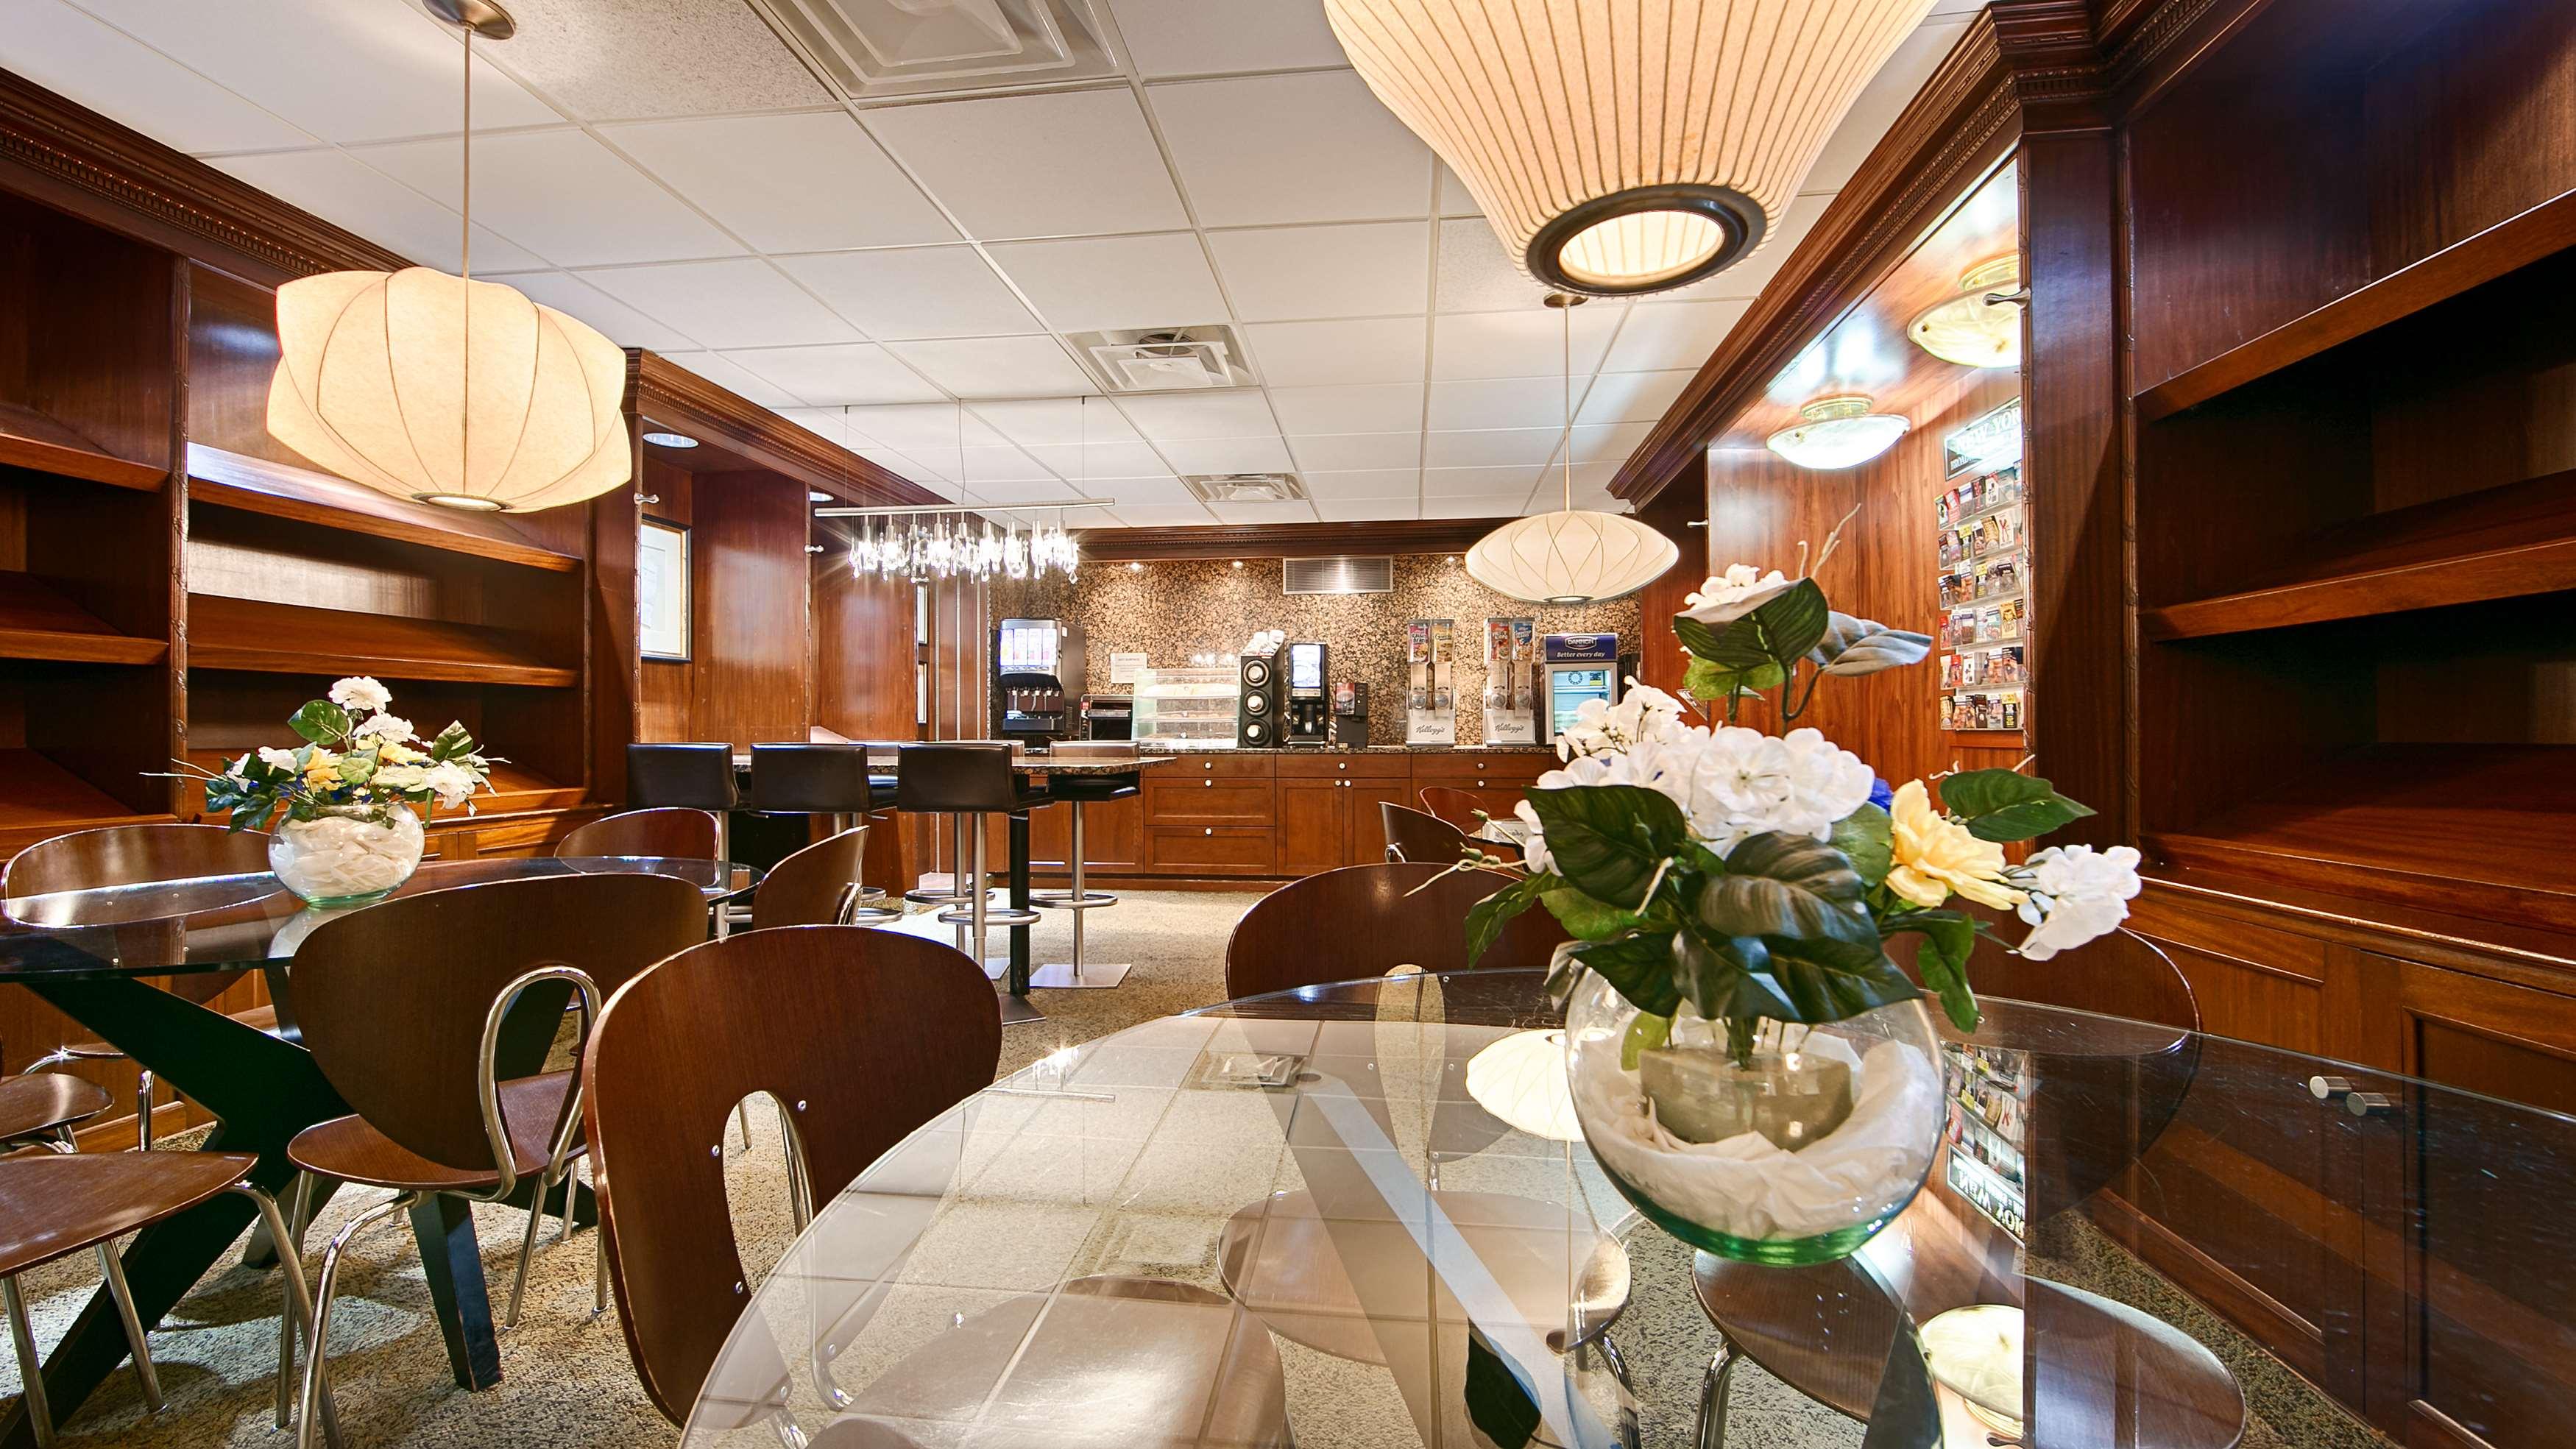 Turkish Restaurant Near Penn Station